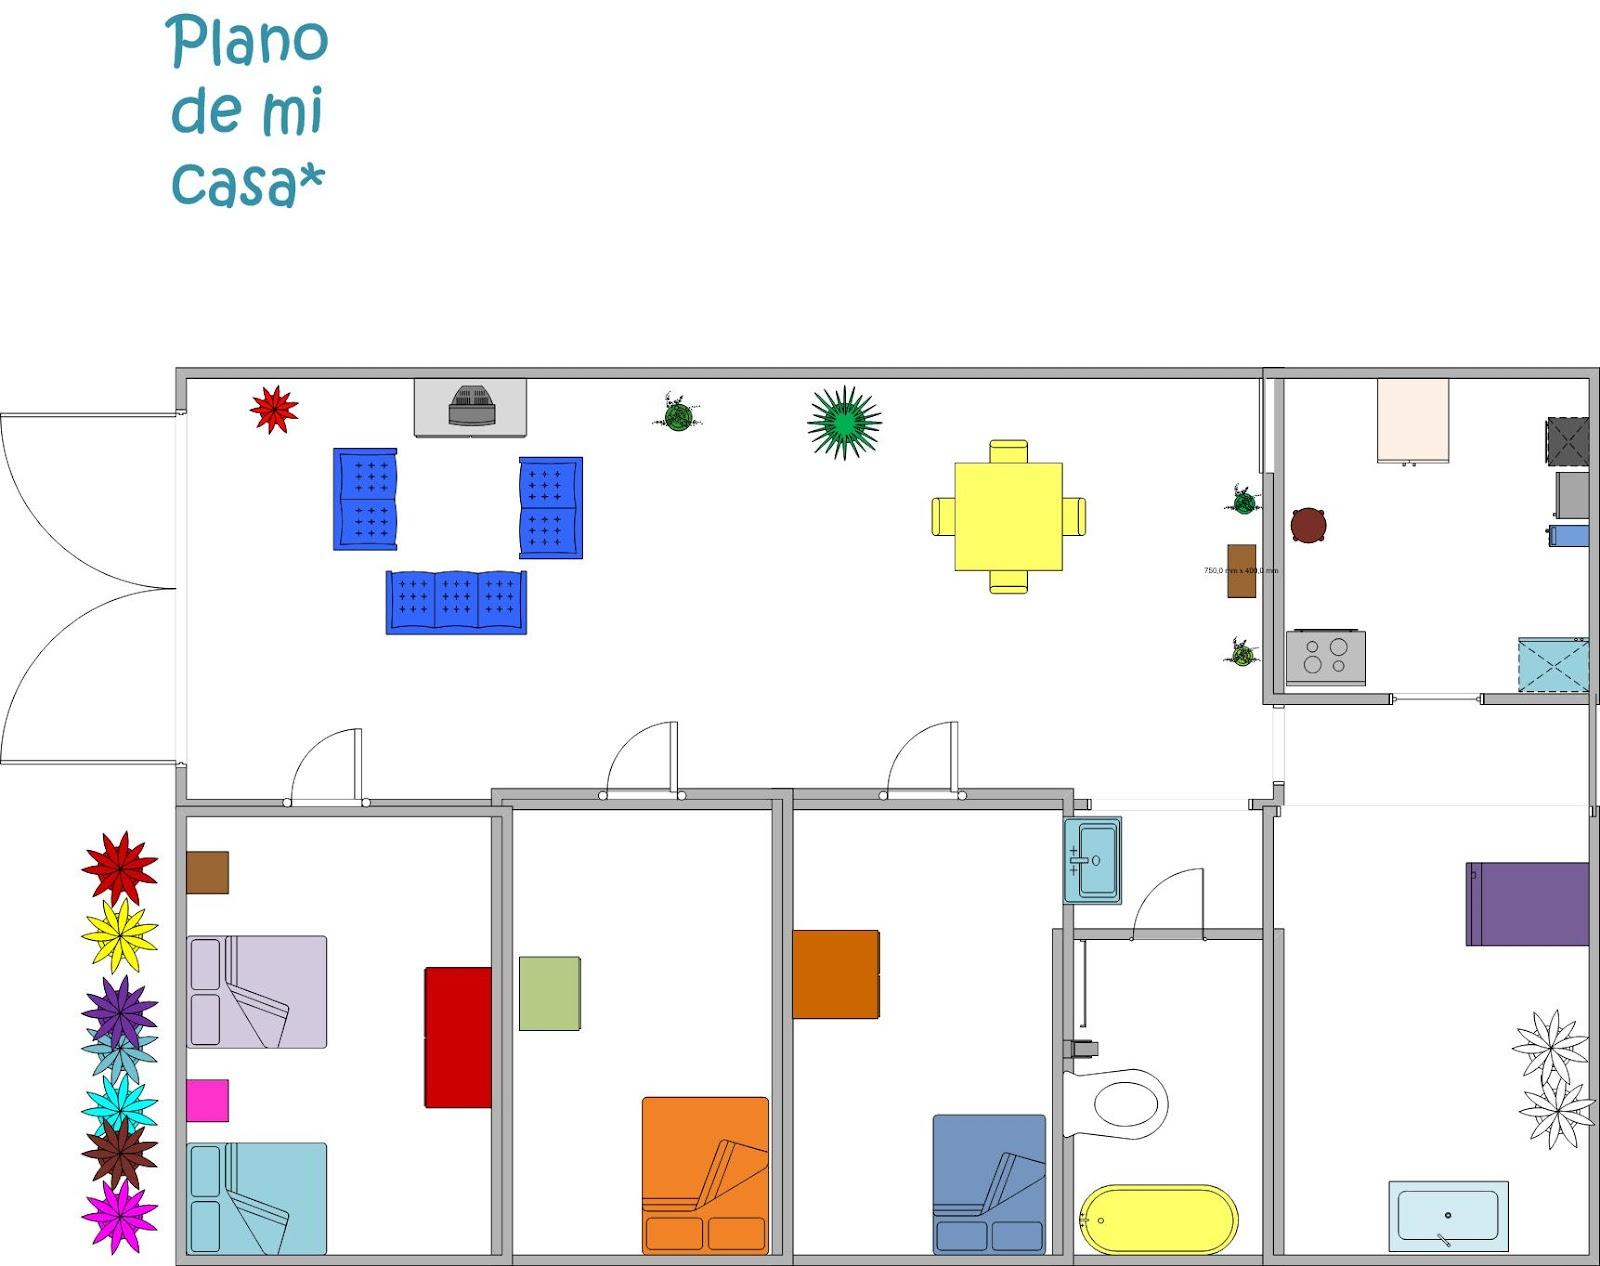 plano de mi casa dise os arquitect nicos On planos para mi casa